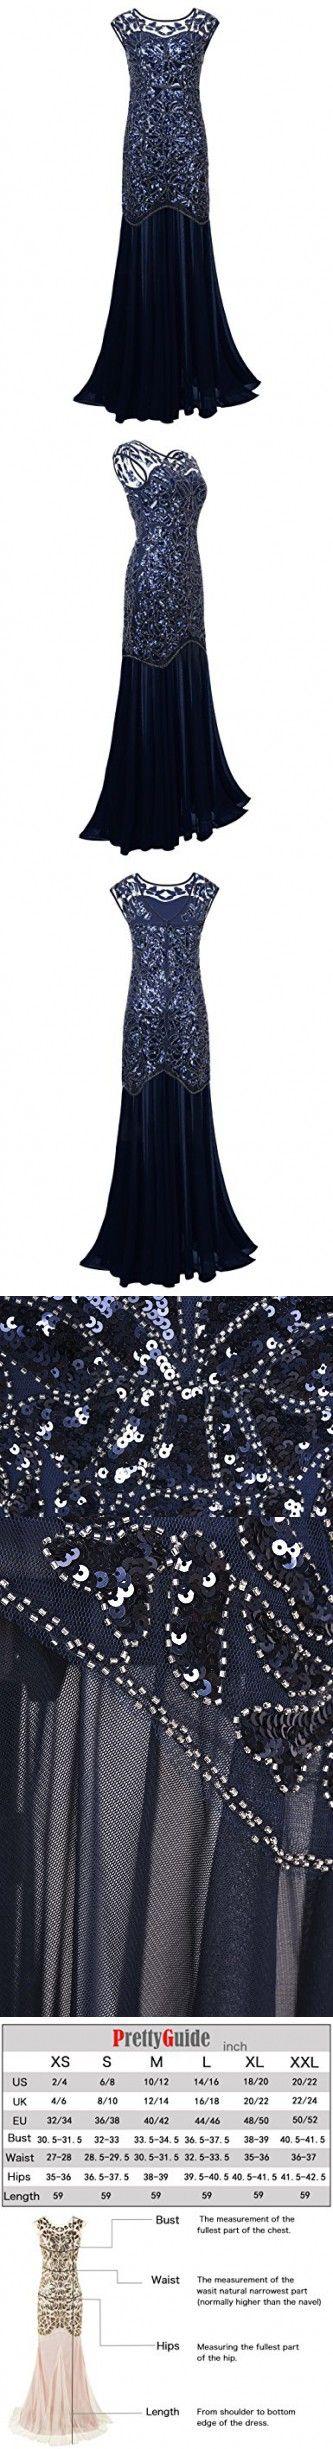 9da6682510049b PrettyGuide Women 's 1920s Black Sequin Gatsby Maxi Long Evening Prom Dress